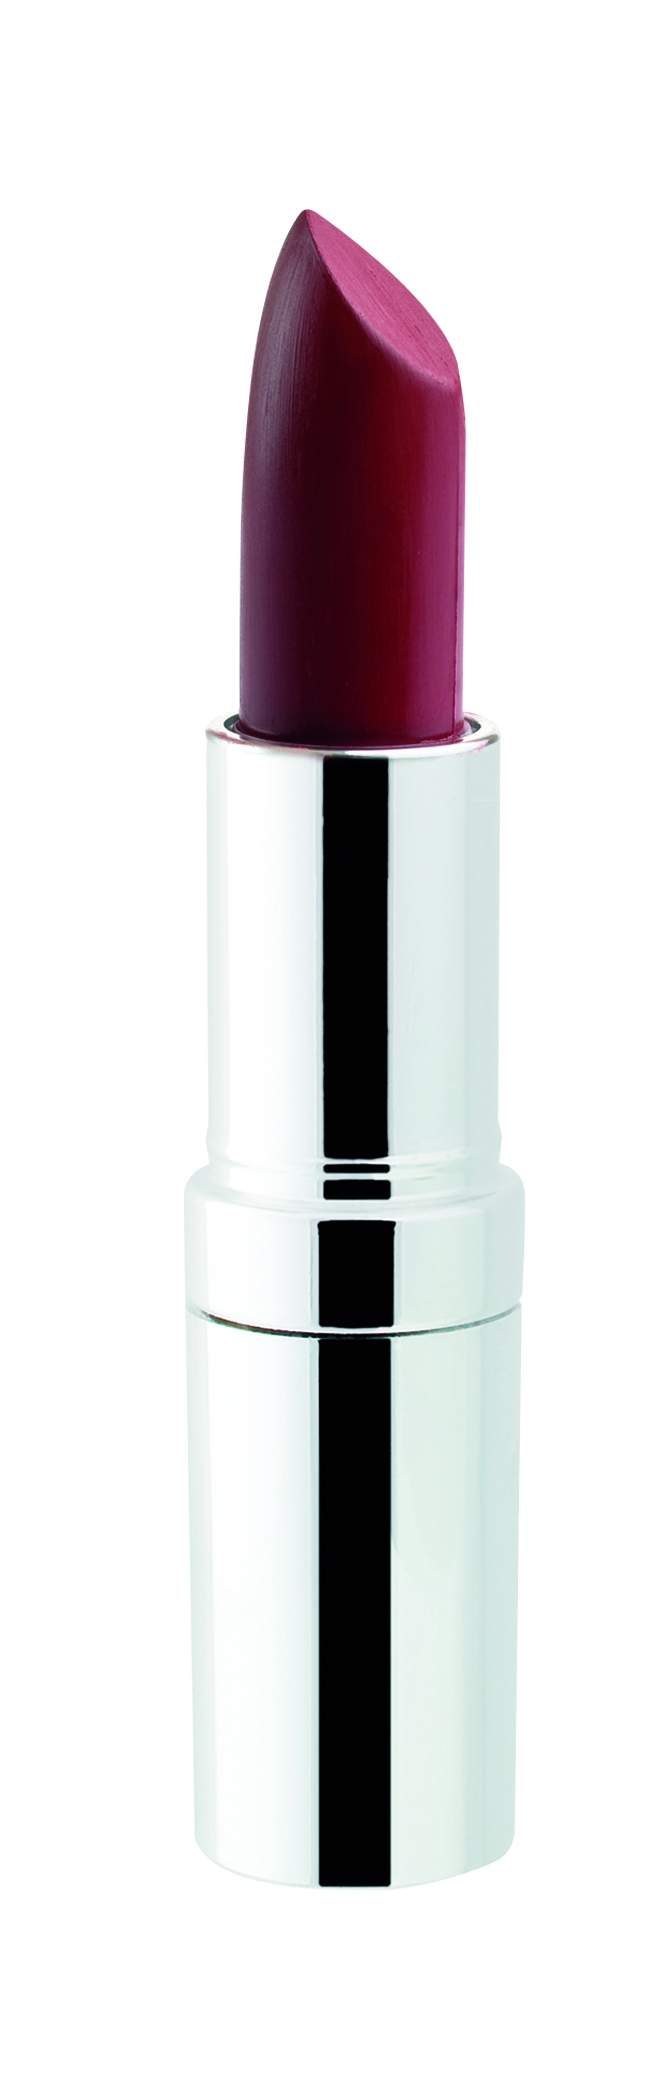 SEVENTEEN Помада губная устойчивая матовая SPF 15, 37 пьяная вишня / Matte Lasting Lipstick 5 г